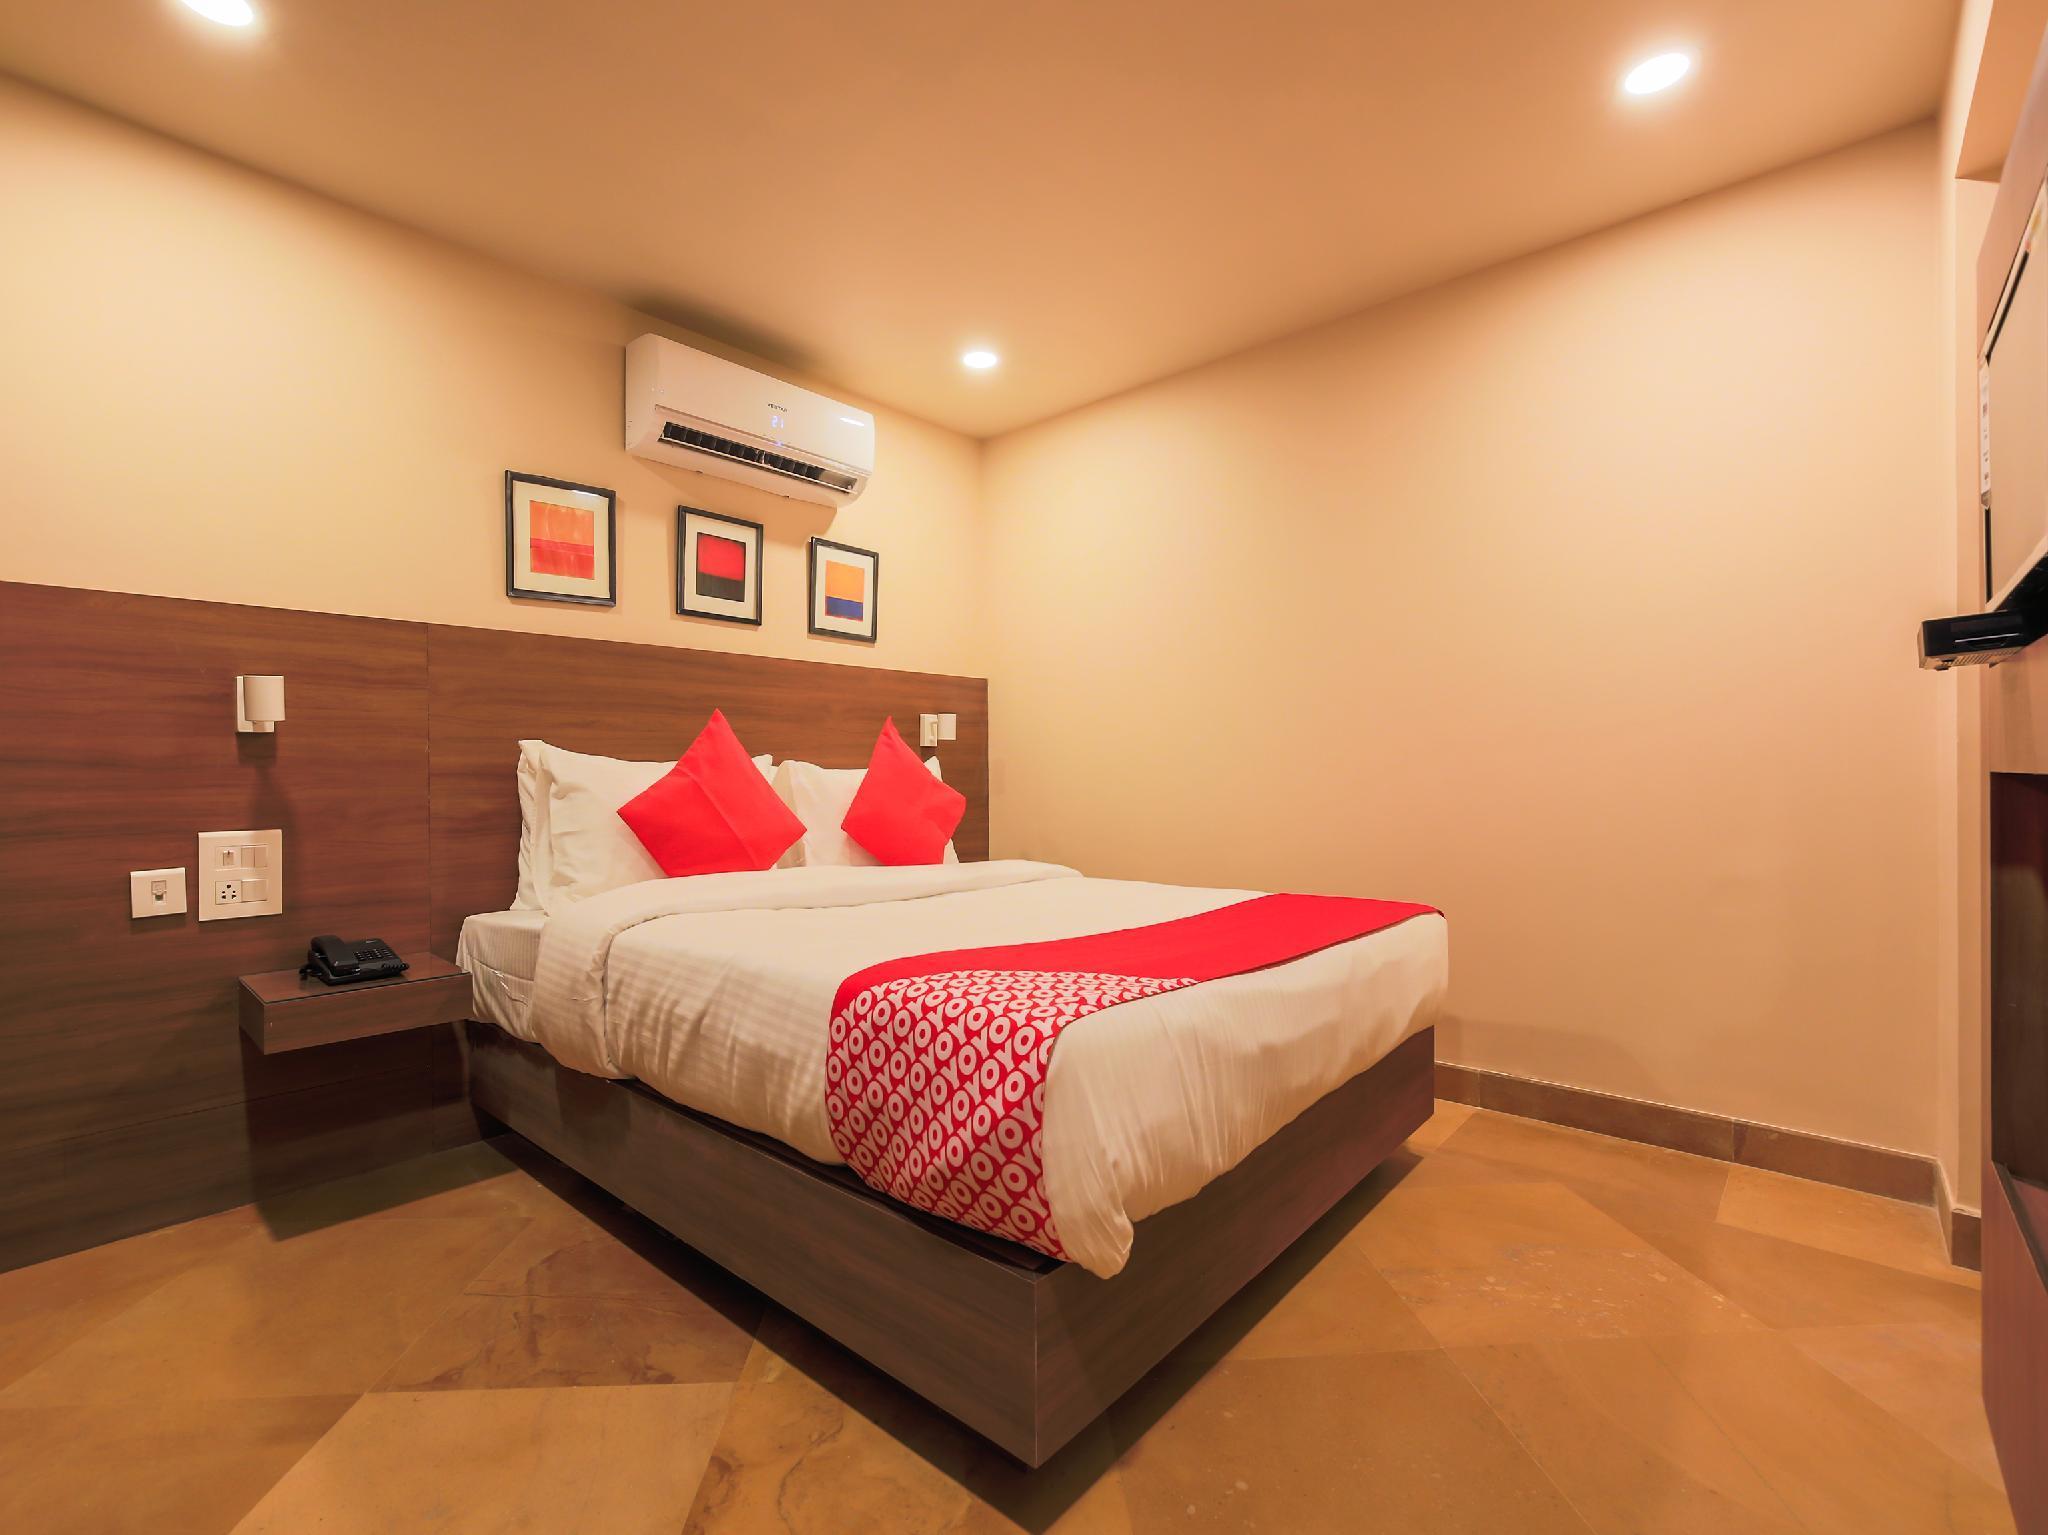 OYO 18951 City Xpress Hotel Rooms